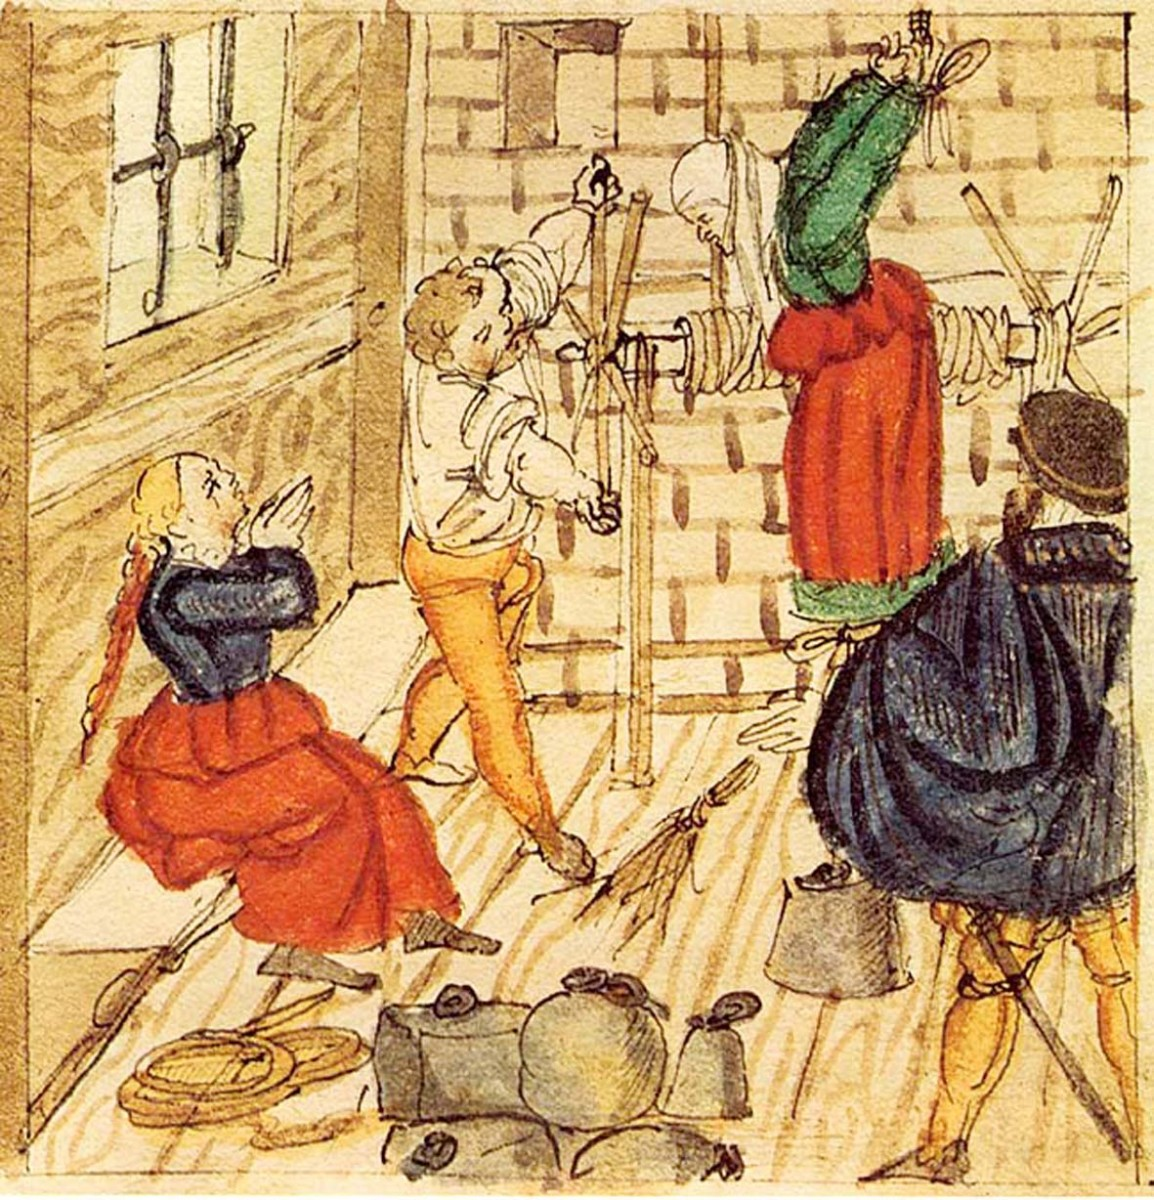 Mittelalter tortur nude image